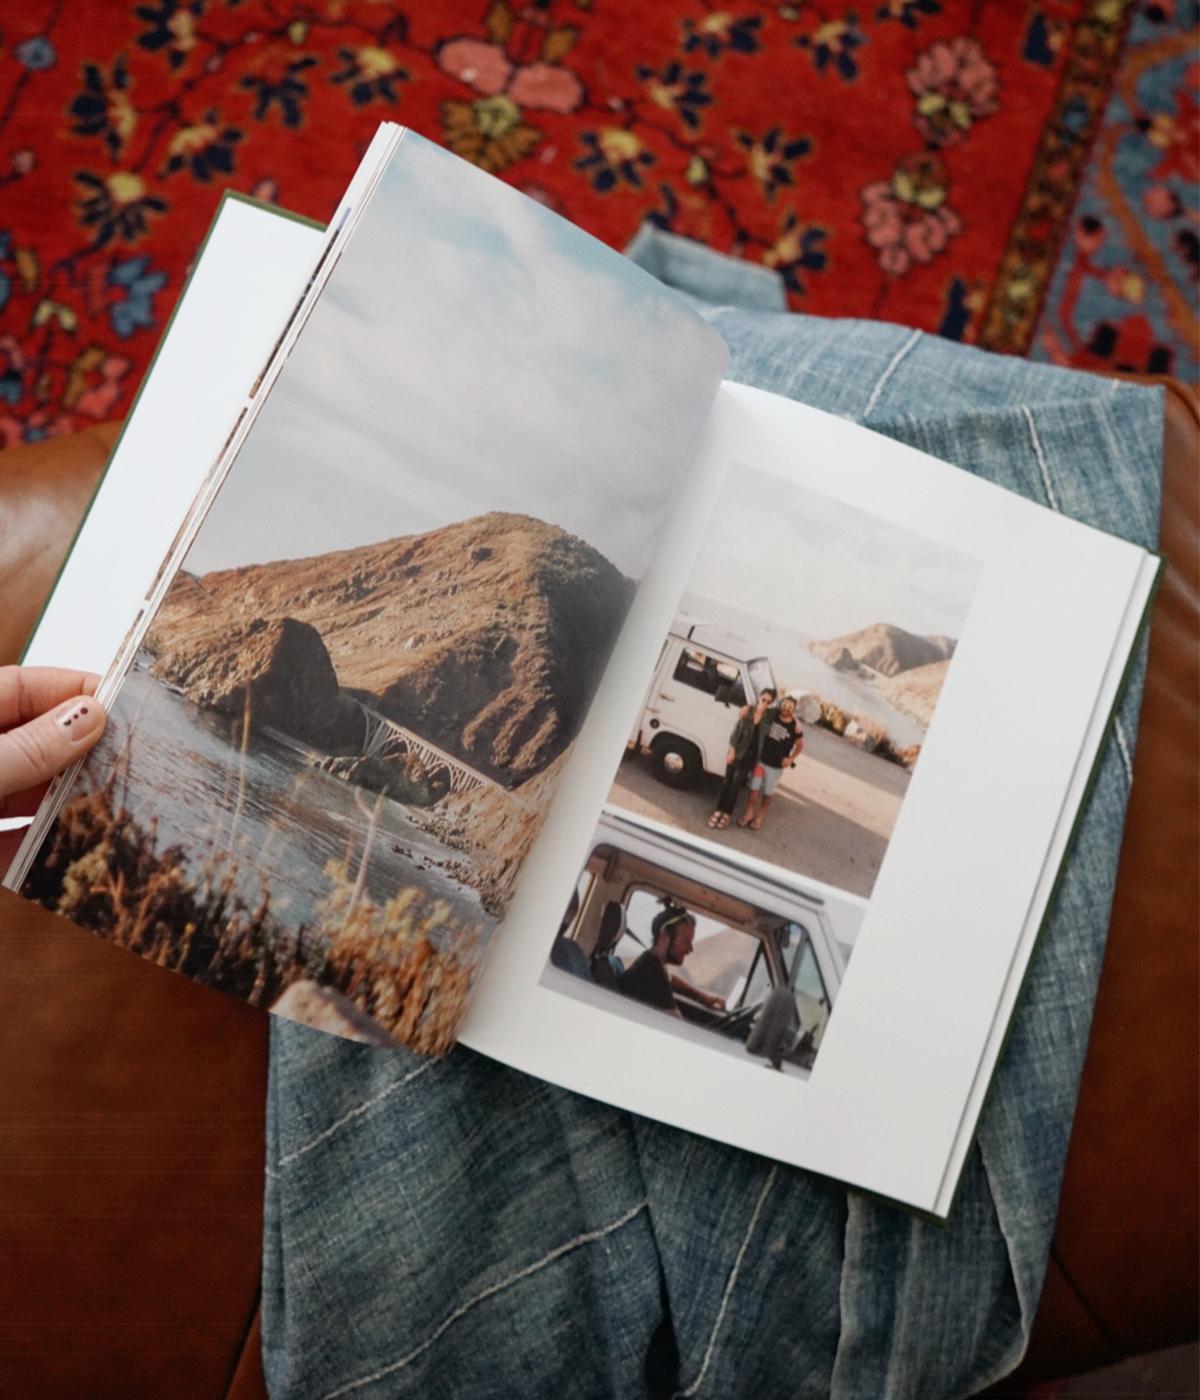 Woman's hand flipping through travel album